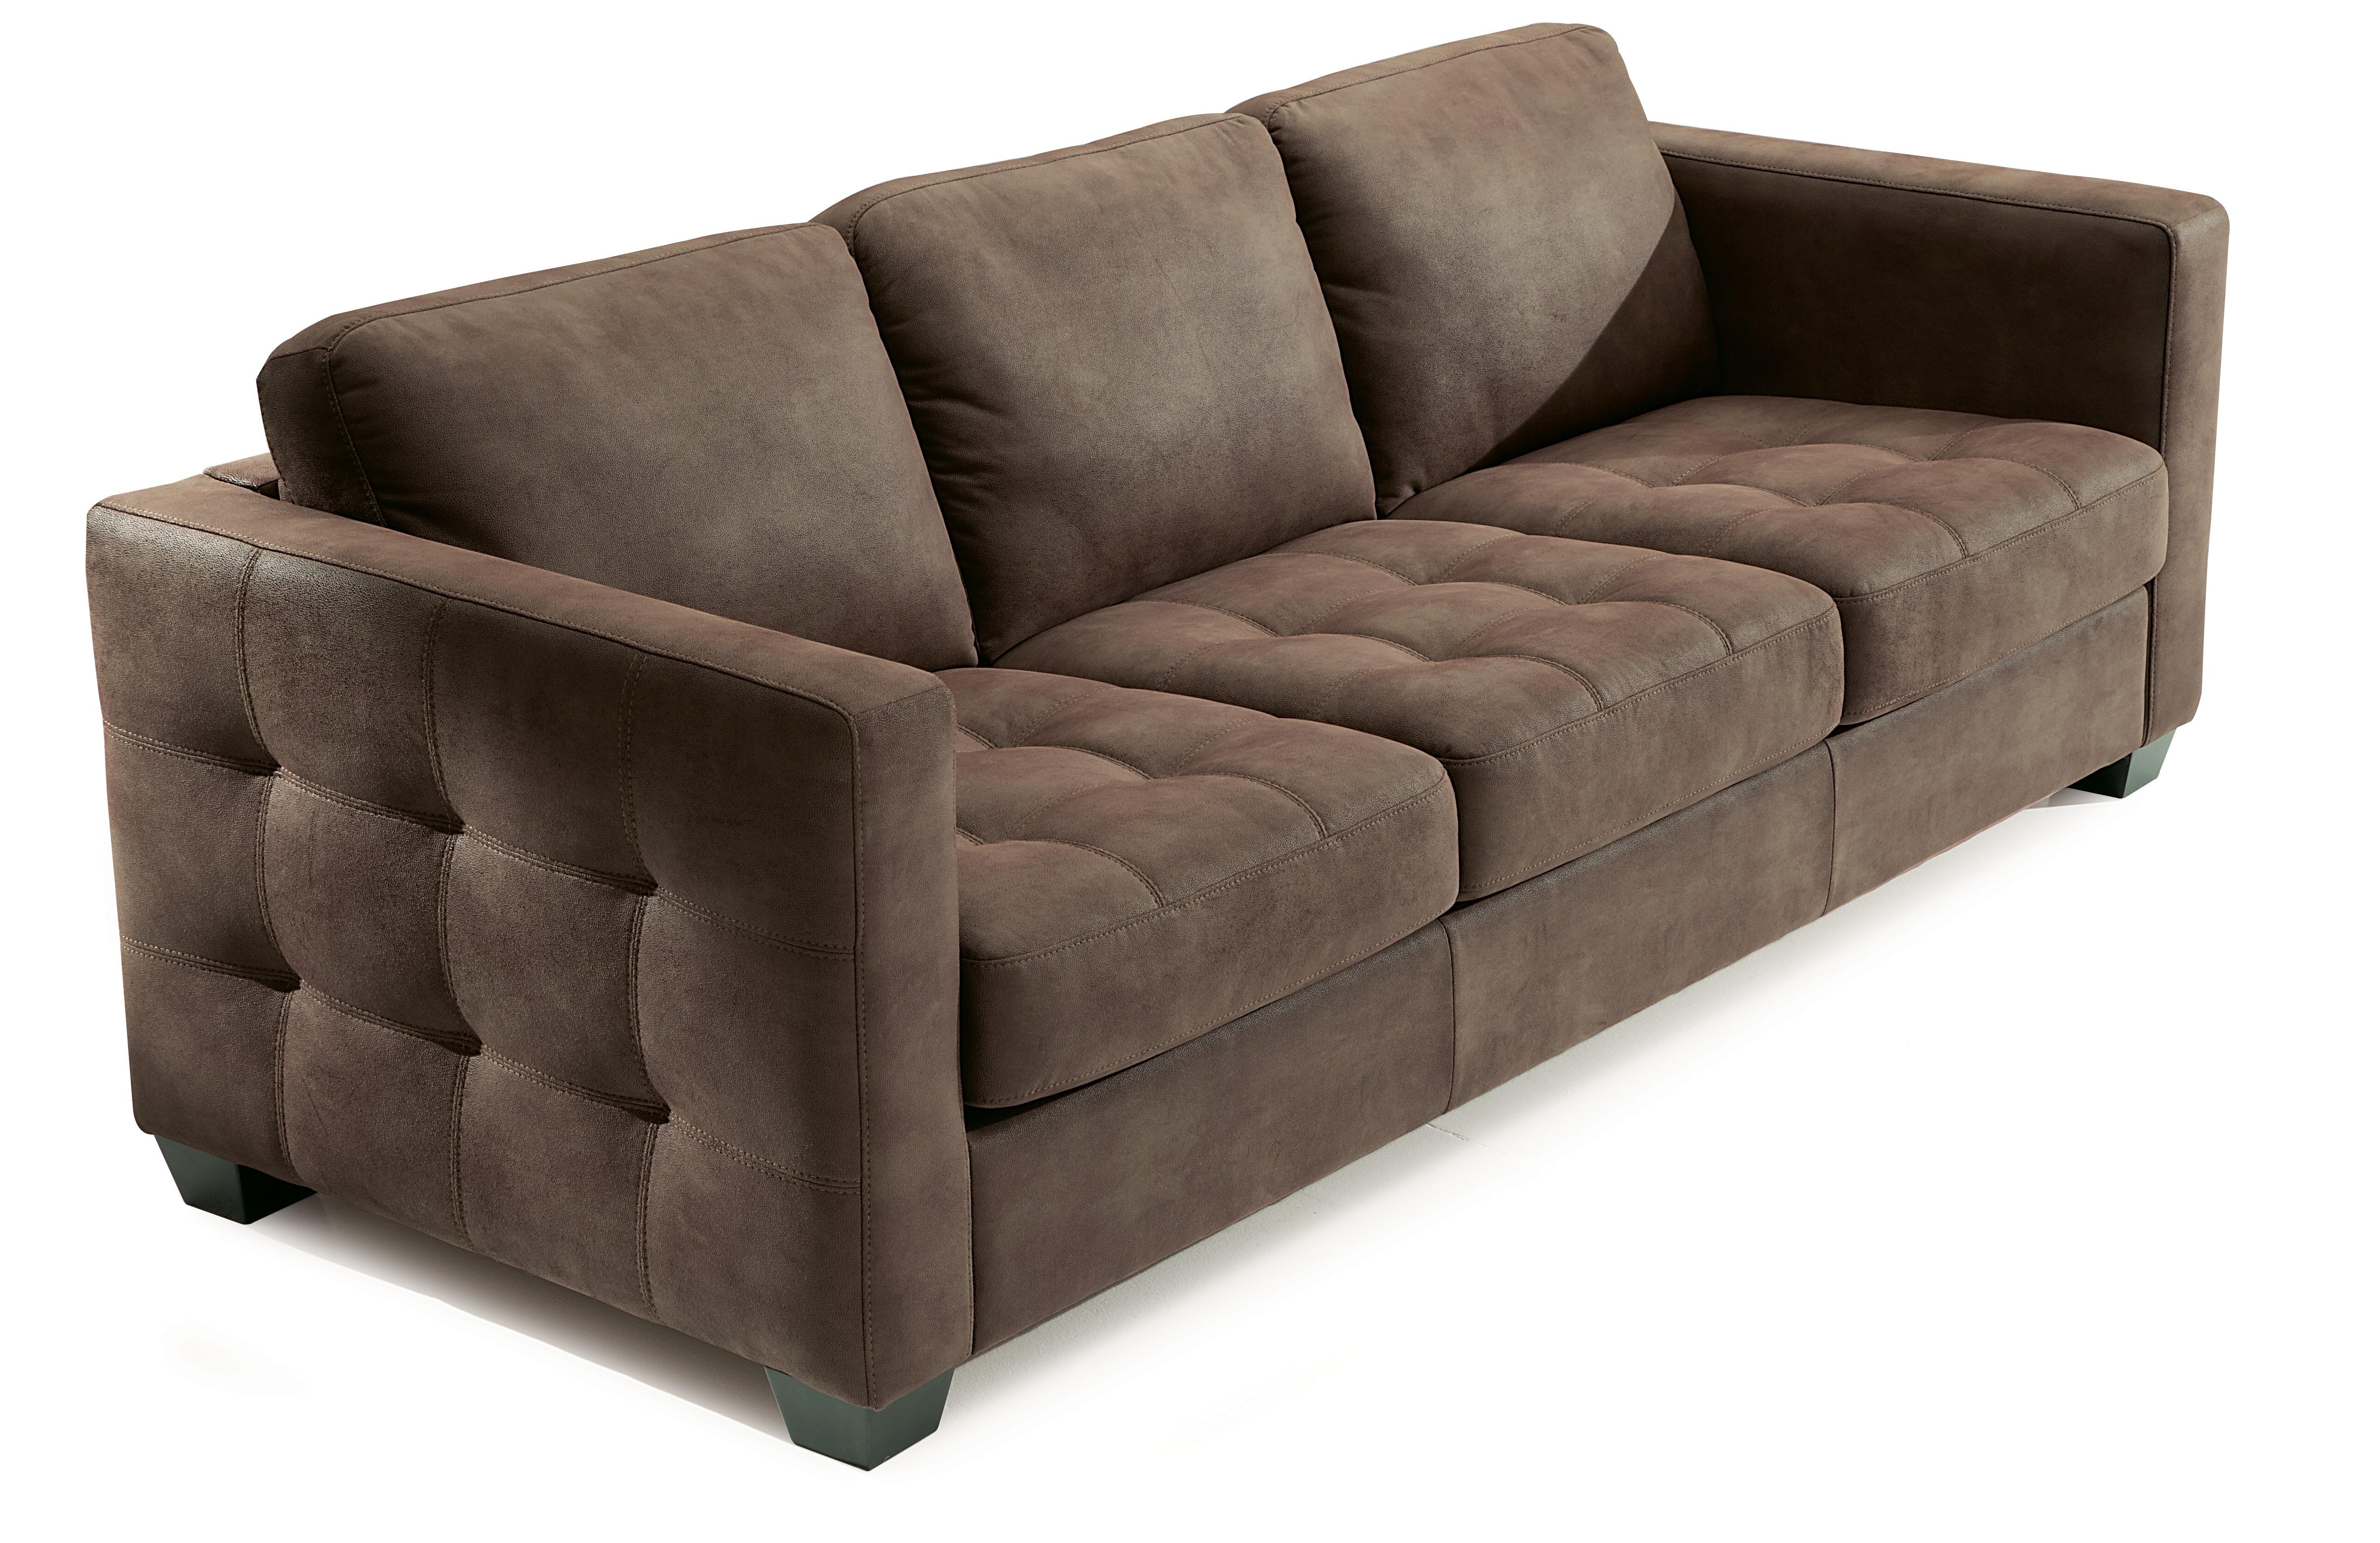 Astonishing Barrett Ottoman 77558 04 Sofas And Sectionals Creativecarmelina Interior Chair Design Creativecarmelinacom